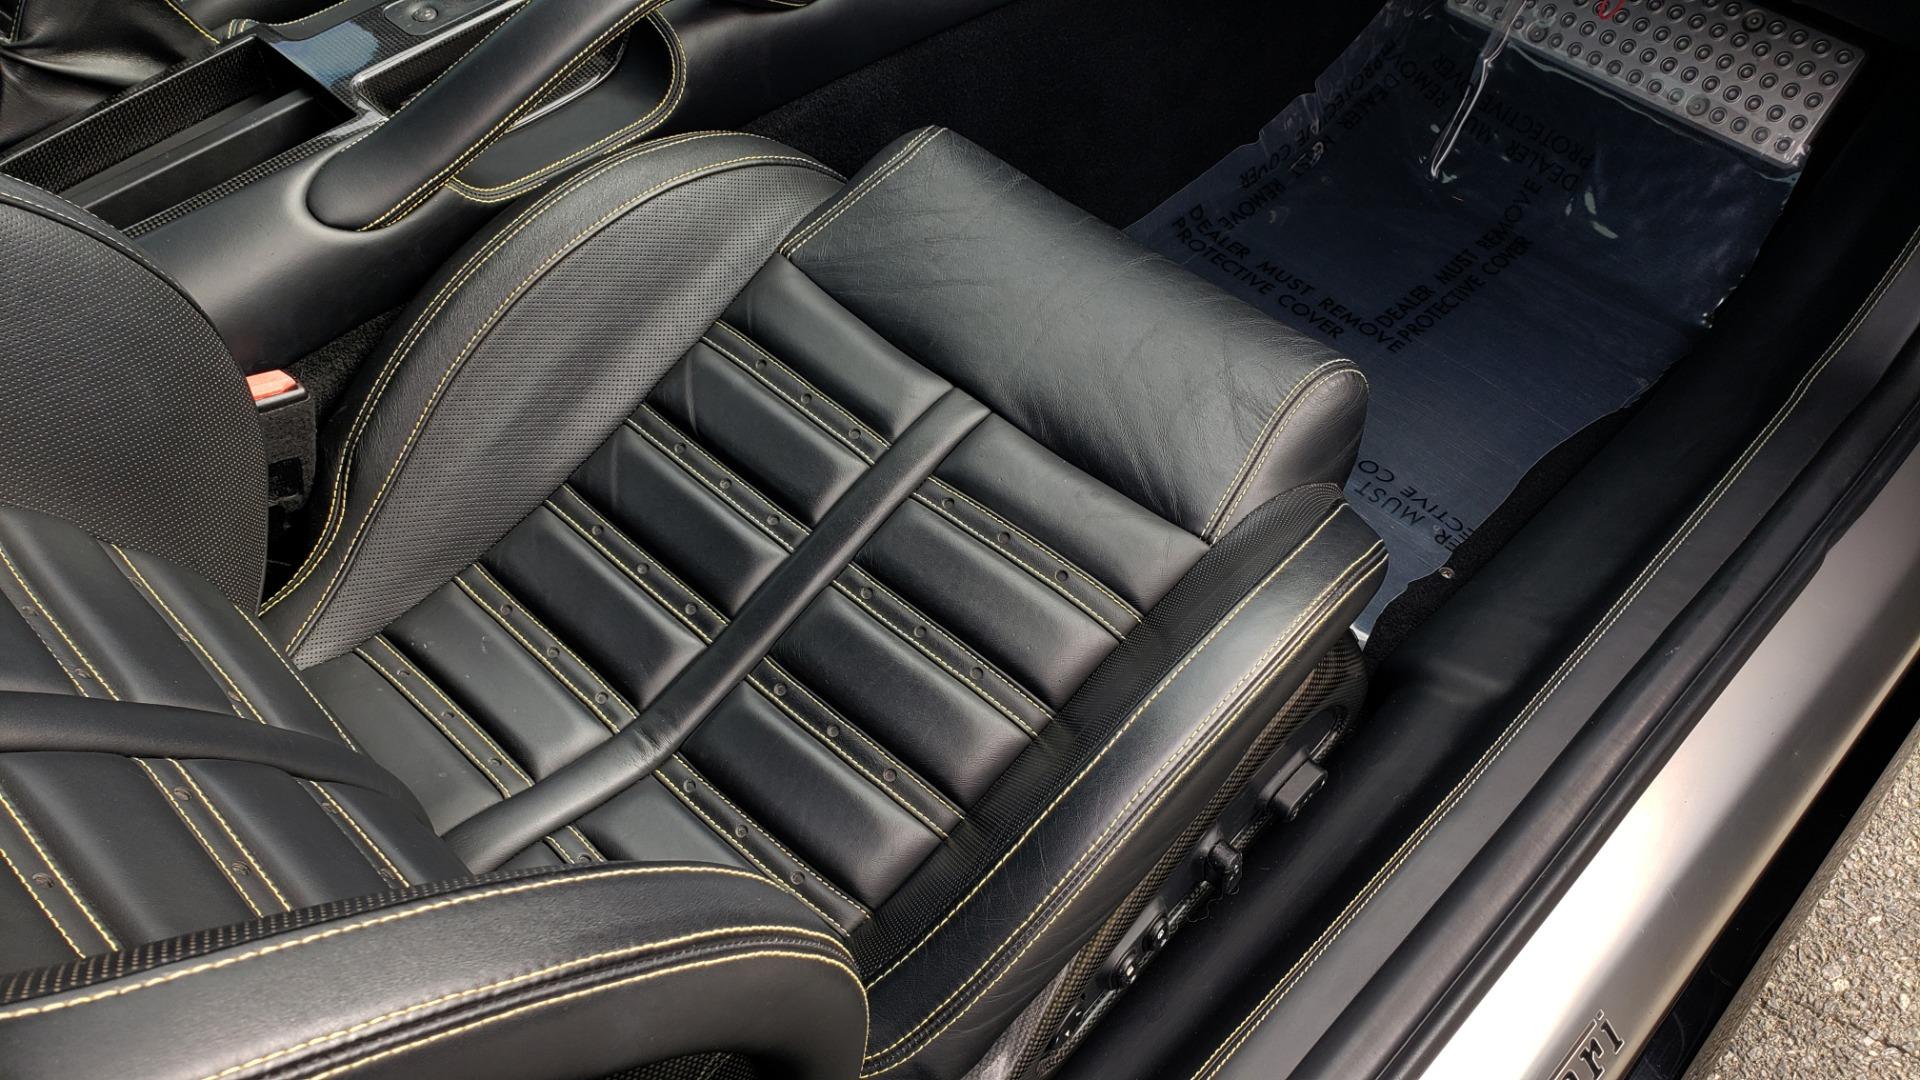 Used 2007 Ferrari 599 GTB FIORANO HGTE / V12 / F1 TRANS / NAV / BOSE / CUSTOM WHEELS for sale $109,999 at Formula Imports in Charlotte NC 28227 36